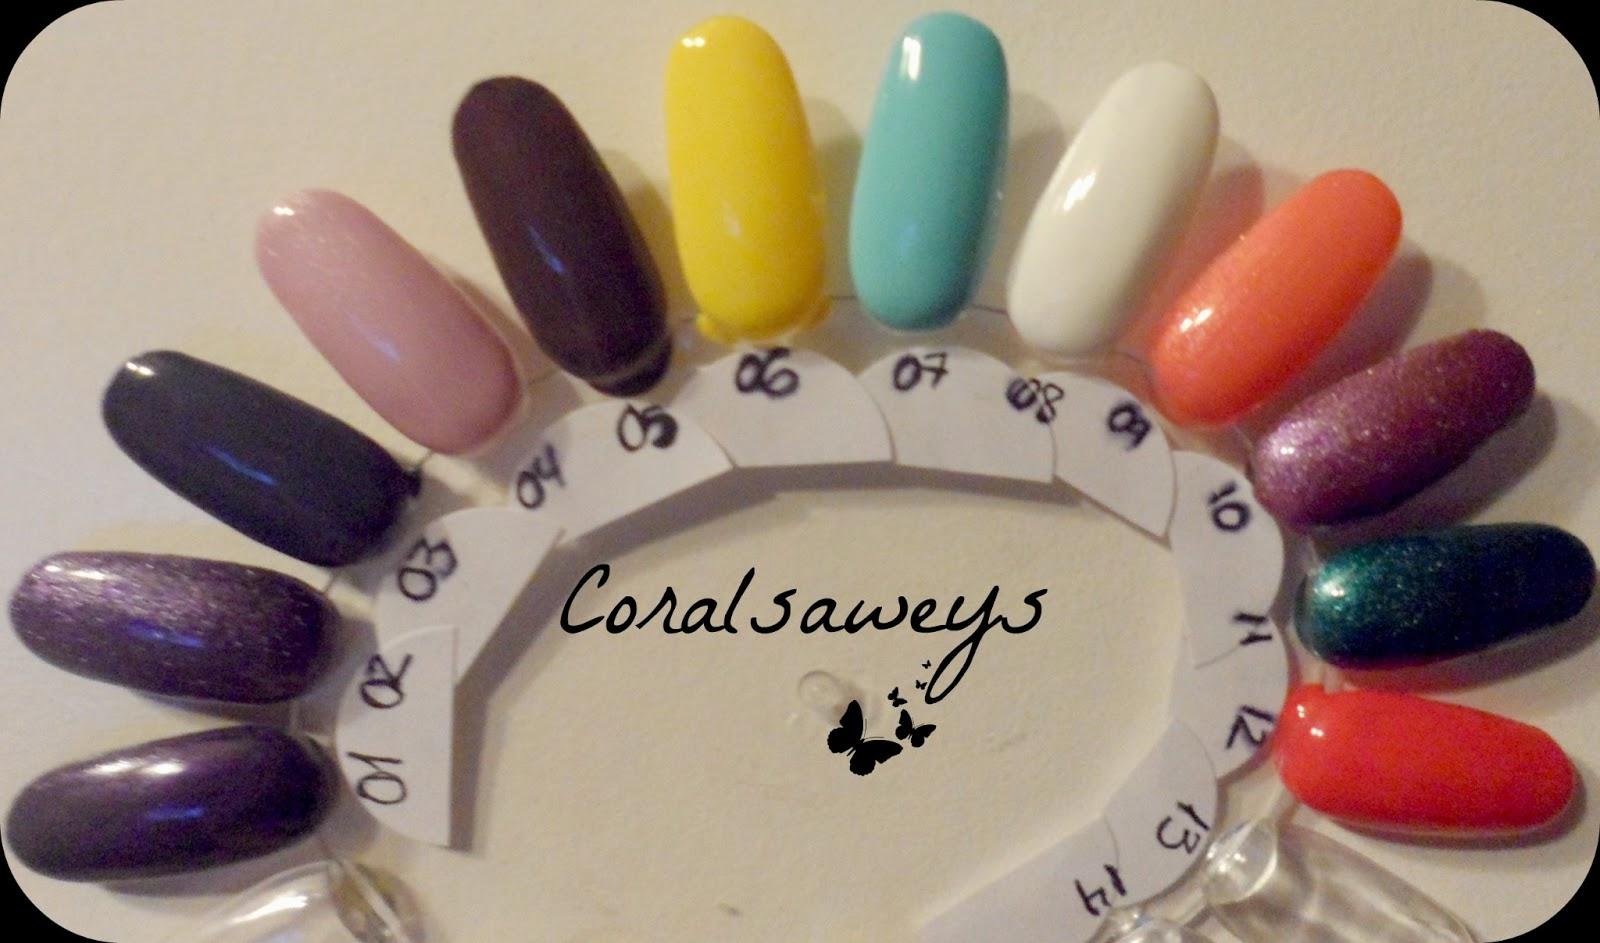 Coralsaweys: PEDIDO A NDED (NAIL DESIGN)